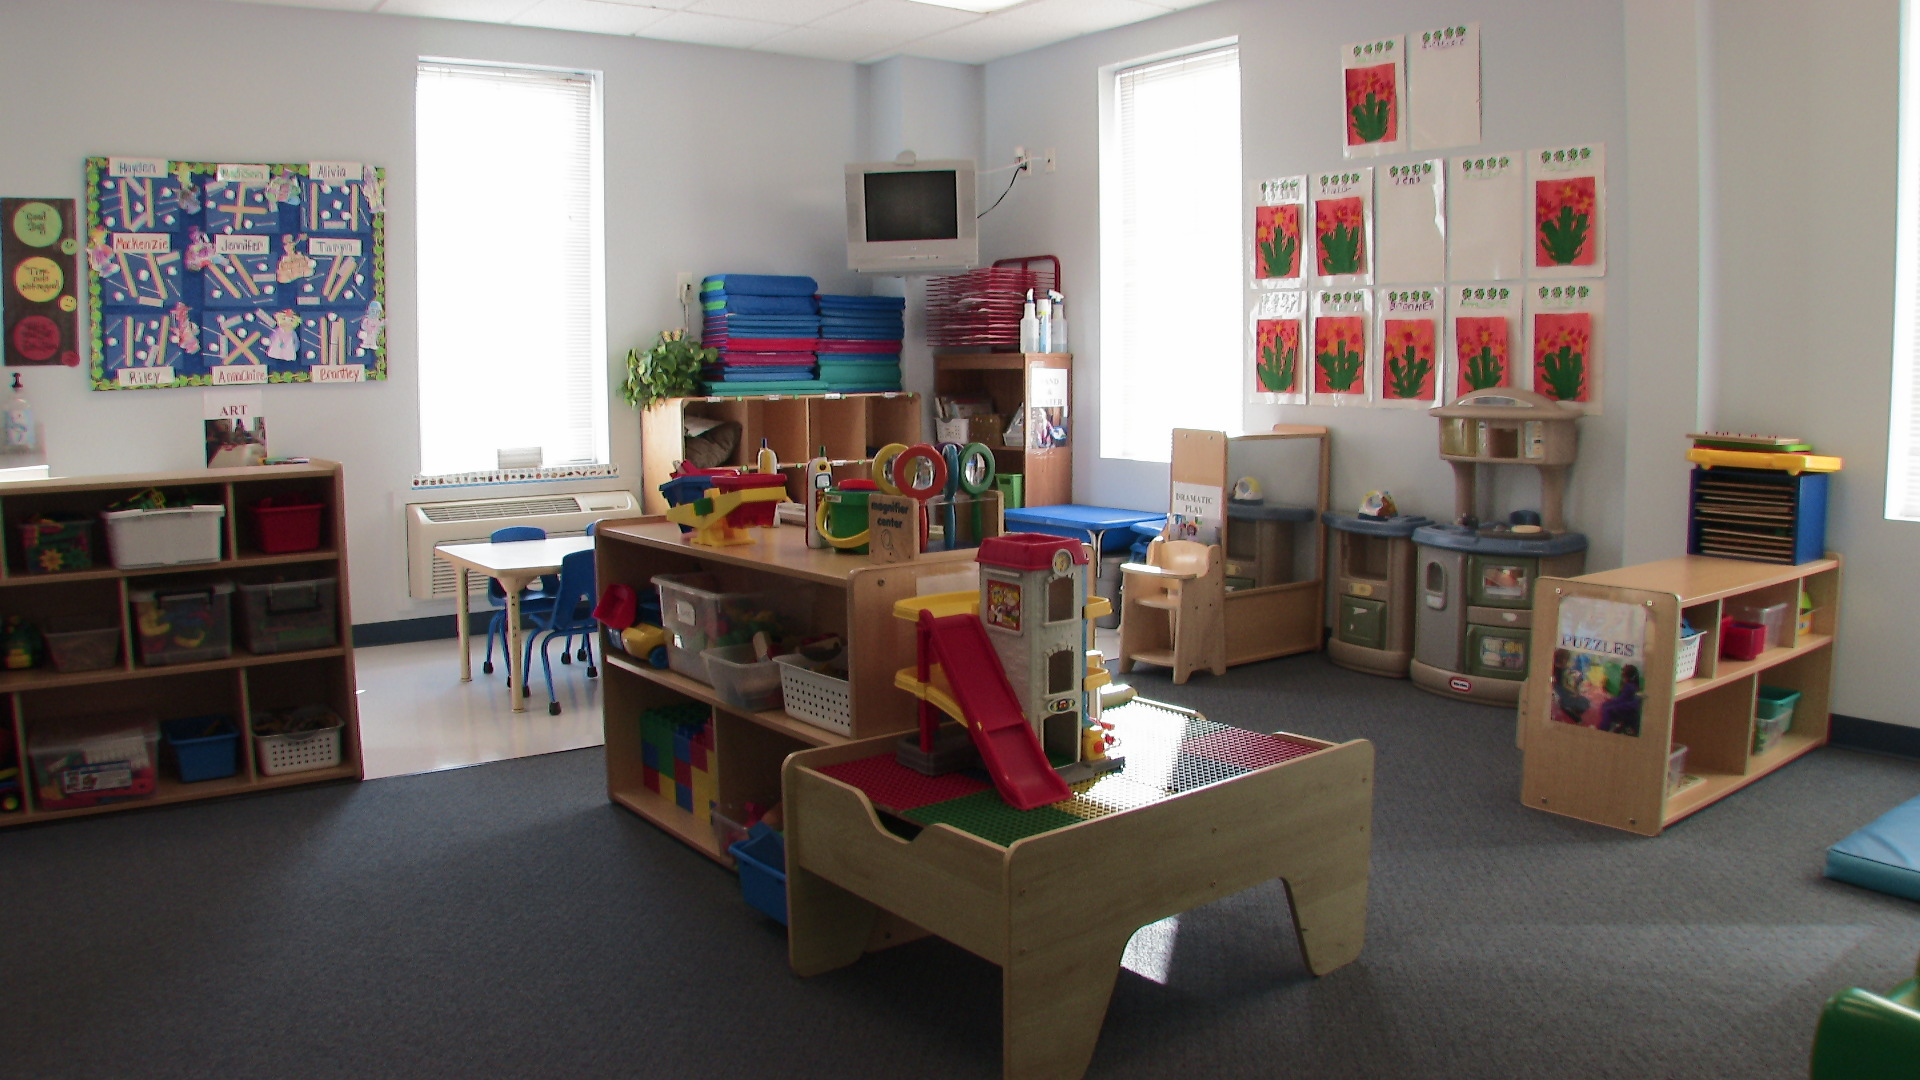 3a4year1 - 4 Year Old Kindergarten